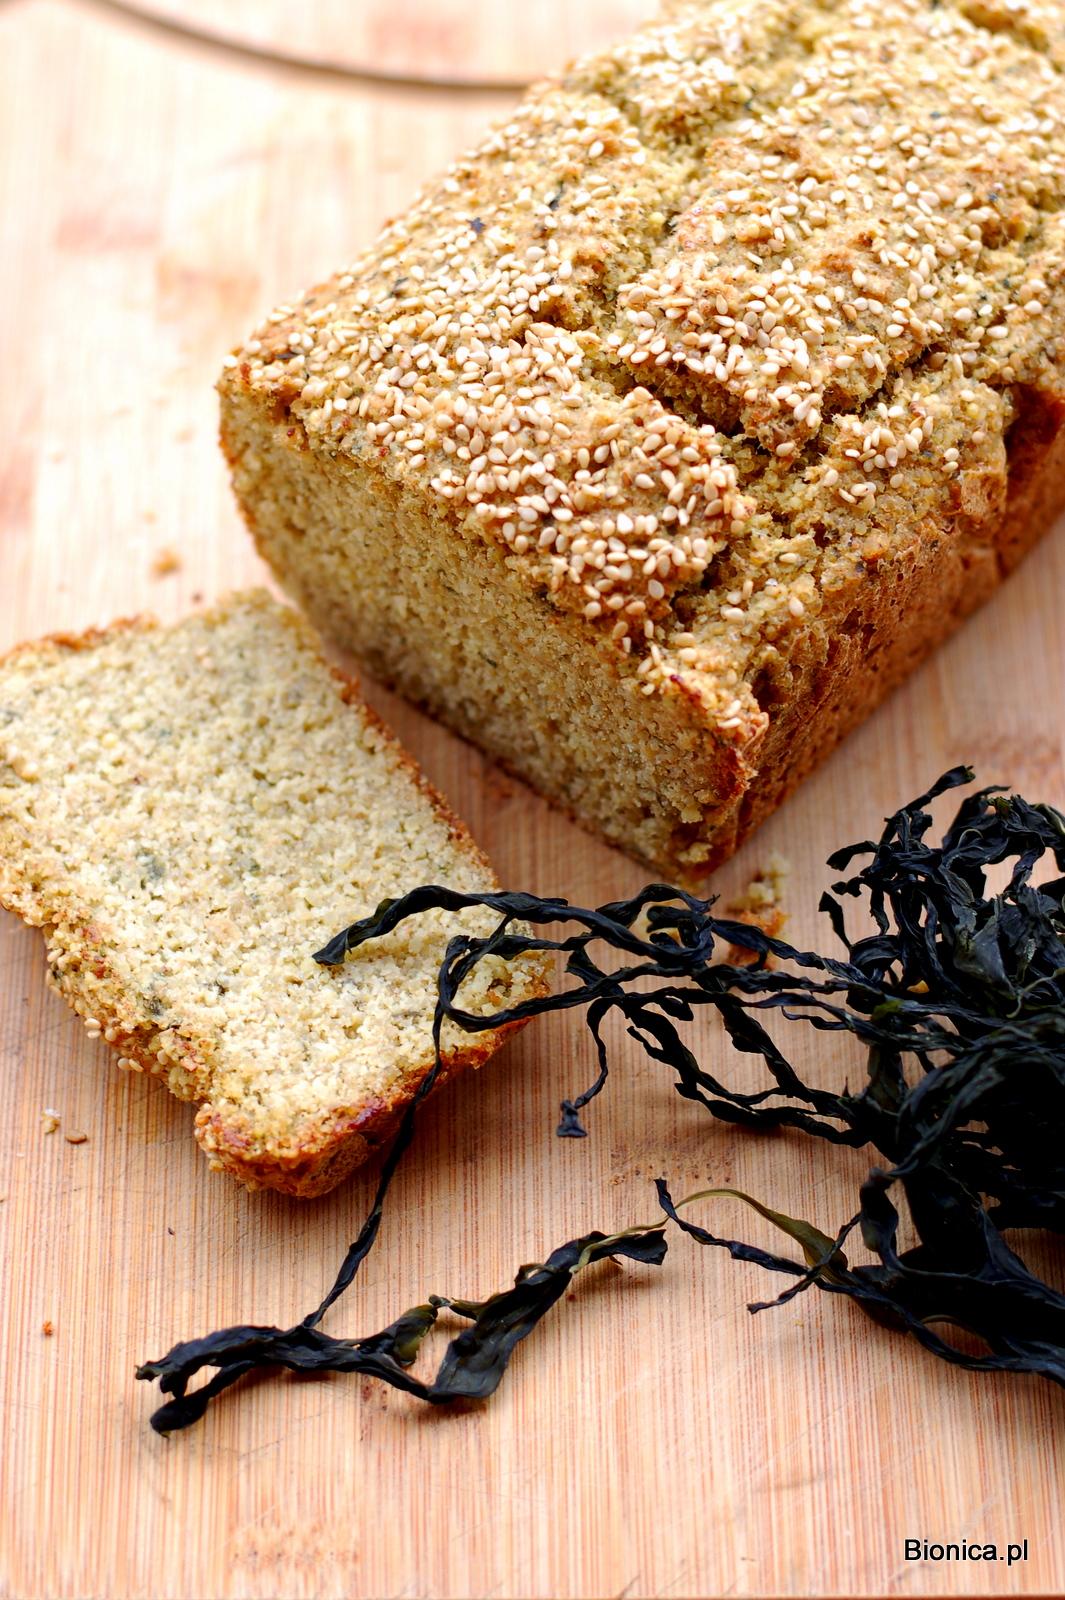 chleb bezglutenowy z glonami morskimi